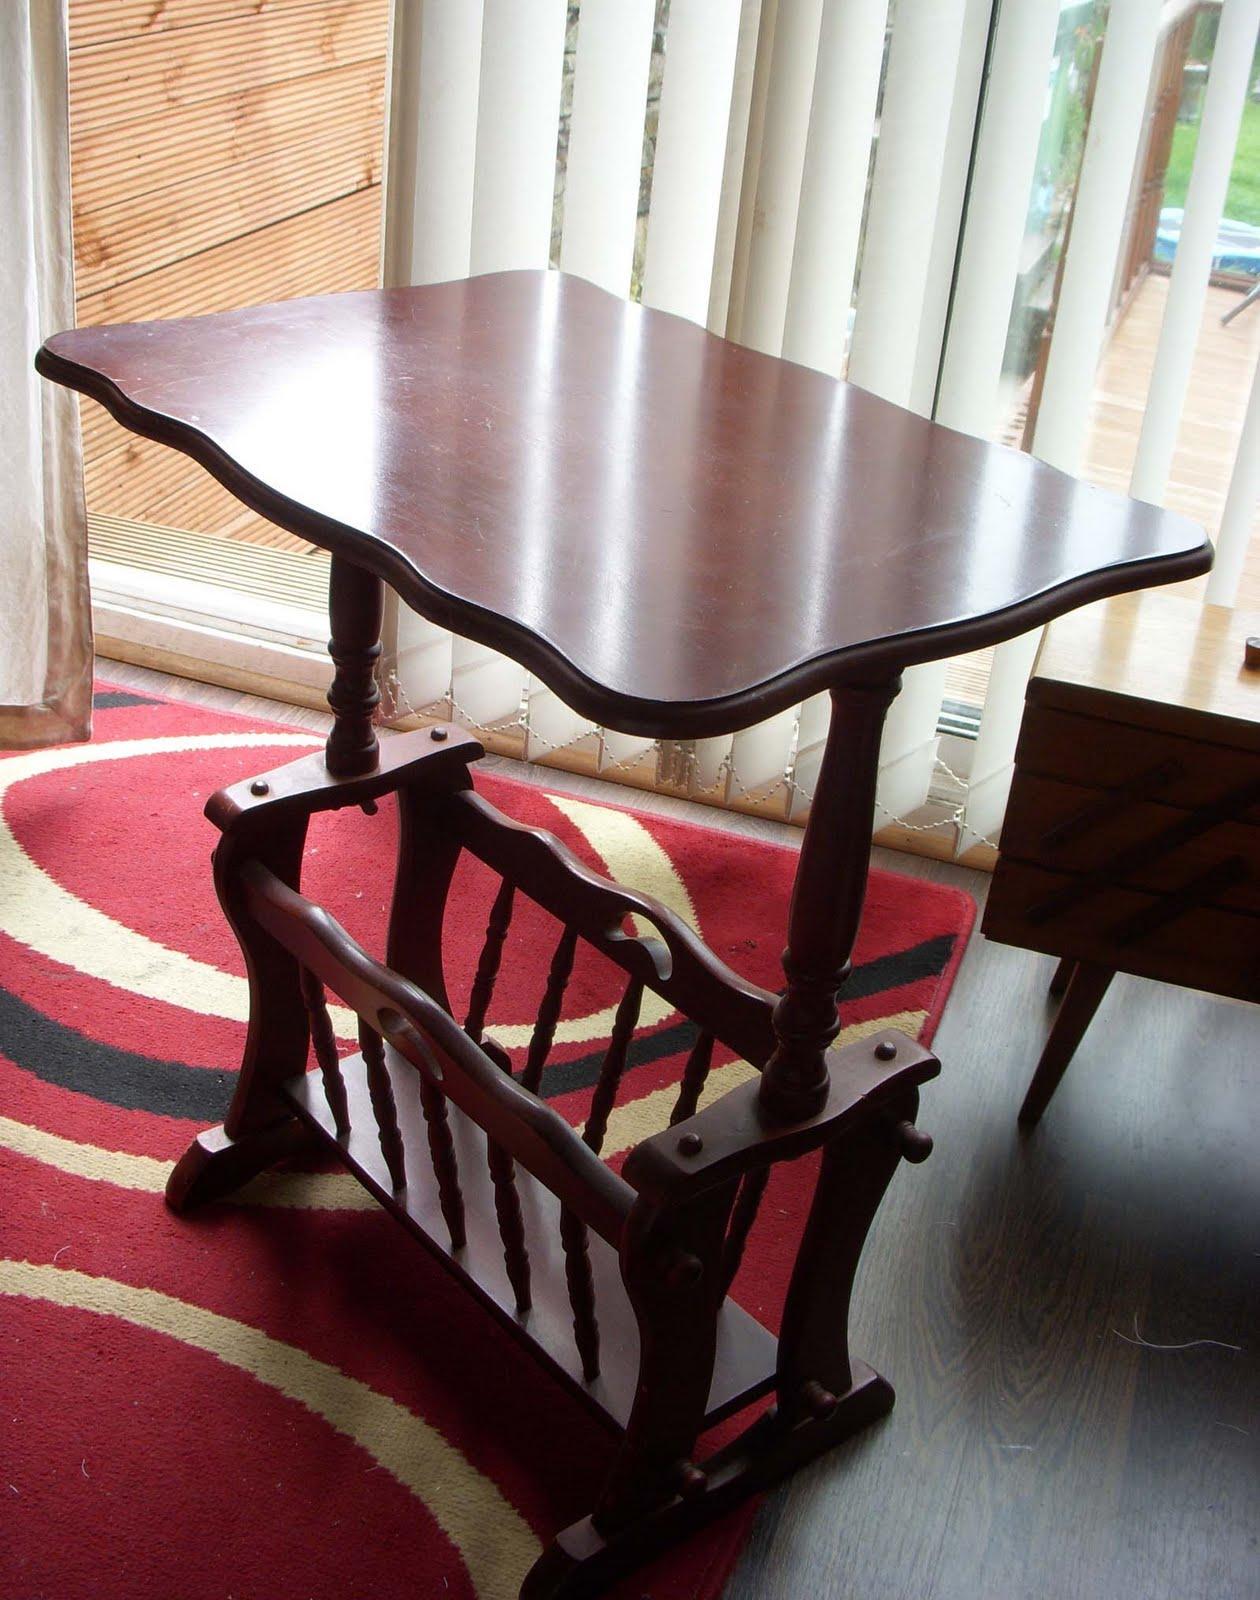 http://1.bp.blogspot.com/_iHhG4m9ecPQ/TFBIXES6tEI/AAAAAAAAARs/uveDXvvqIJE/s1600/table+mag+holder.JPG